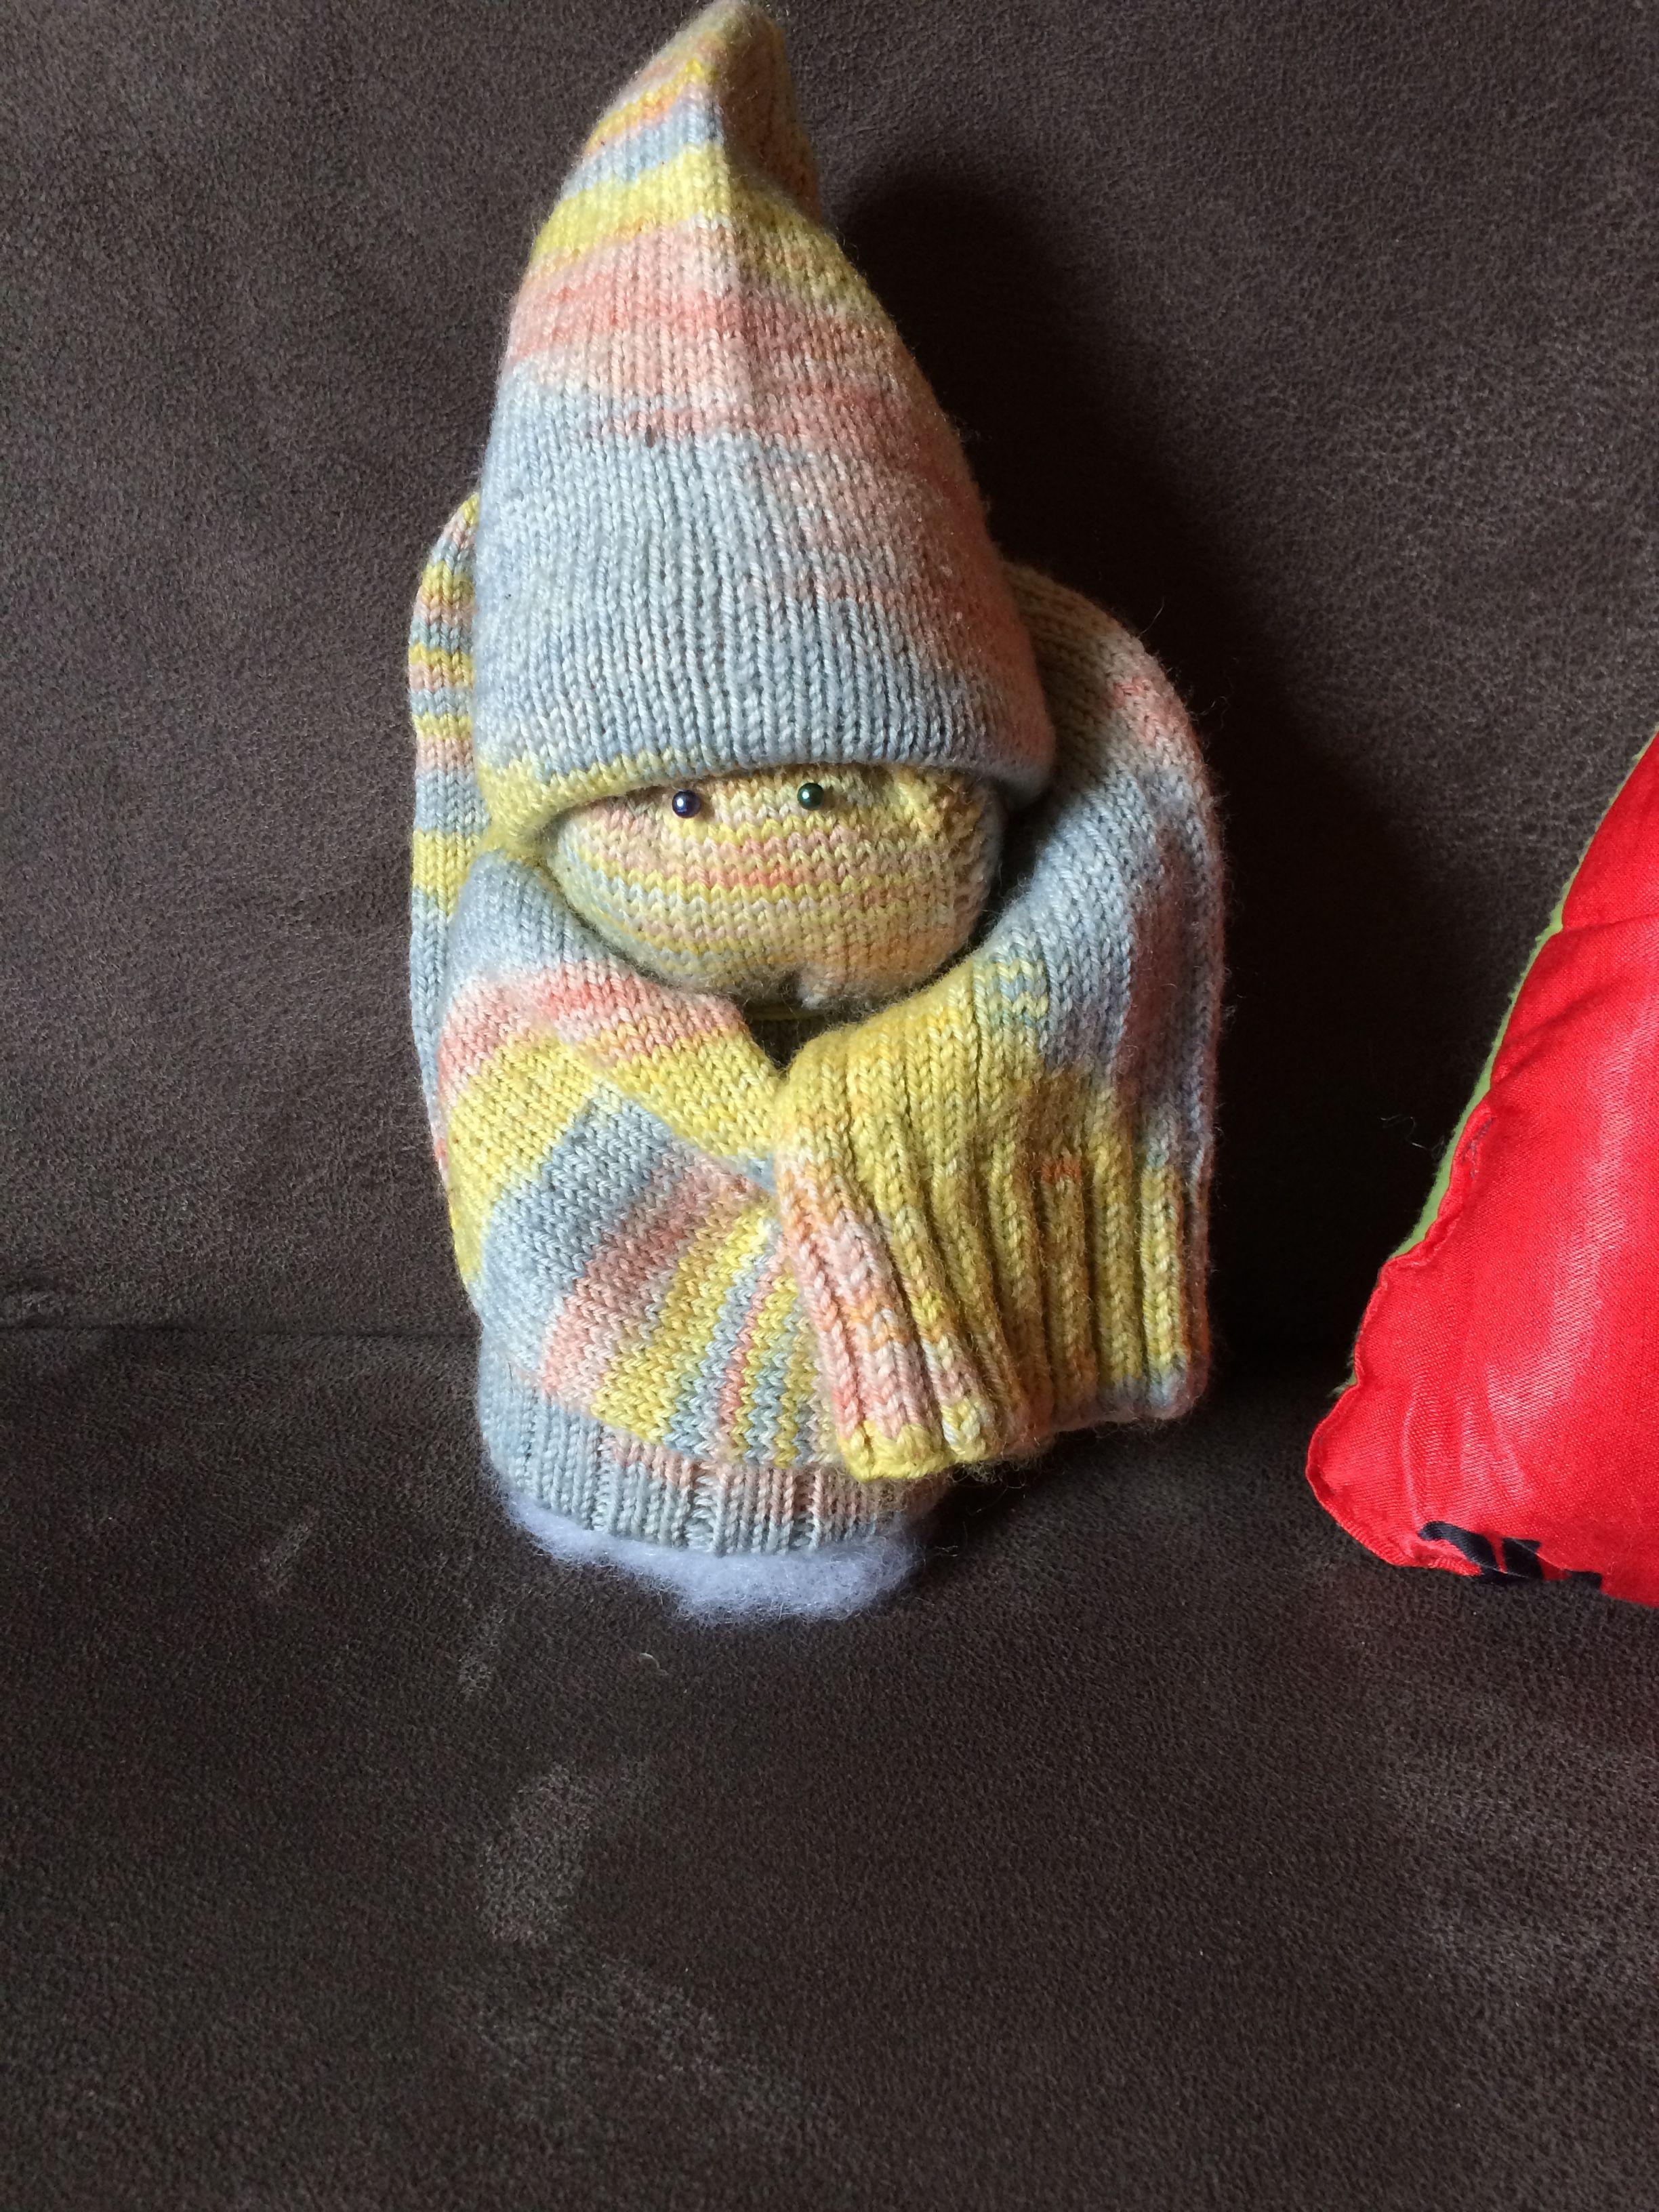 "Sockenmännchen – so verschenkt man Socken ""nett verpackt"" #menscrochetedhats"